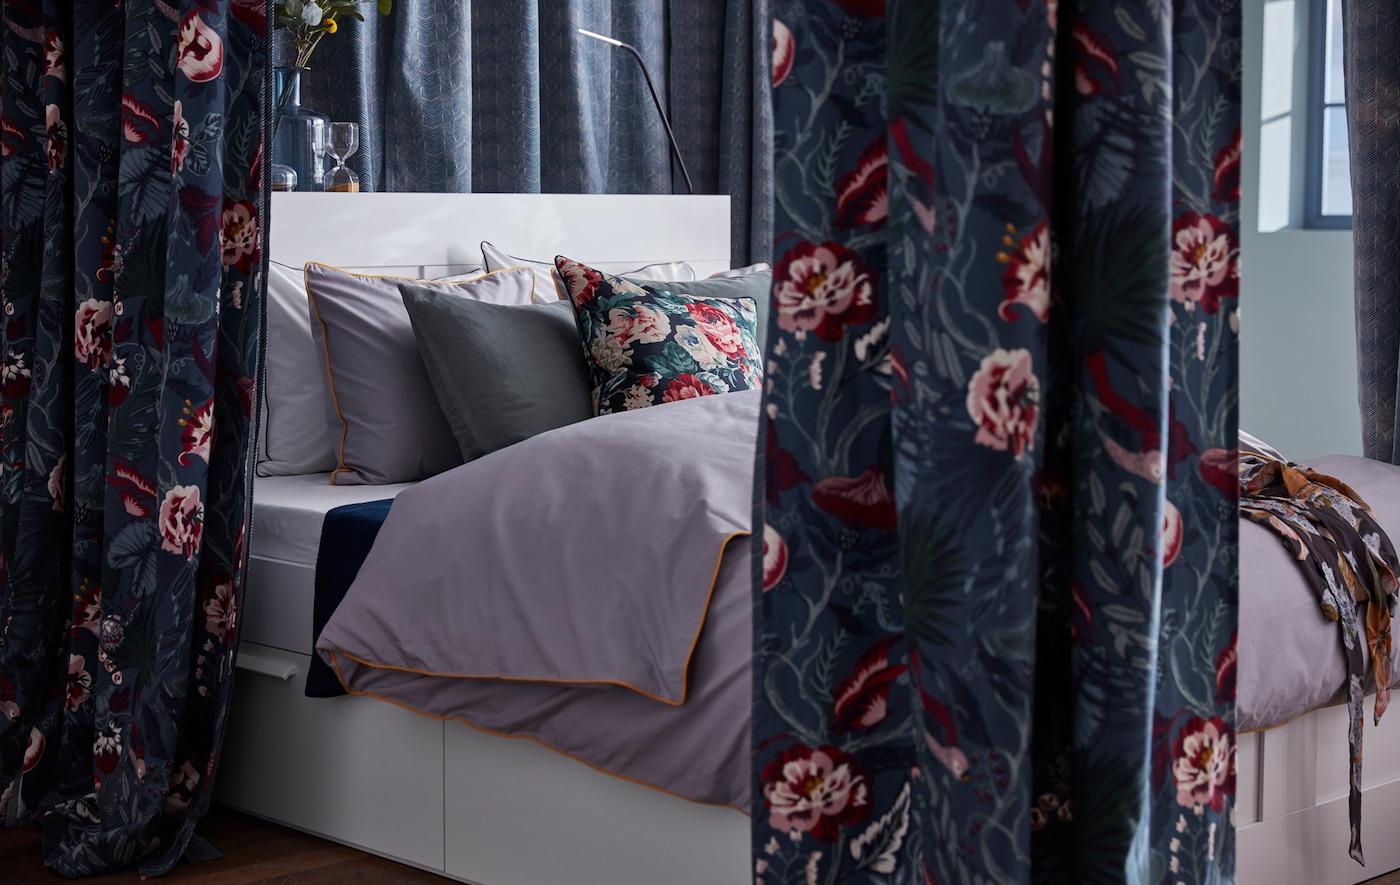 Krevet je uokviren uz nekoliko zavesa od tamnoplave IKEA FILODENDRON tkanine cvetnih šara.